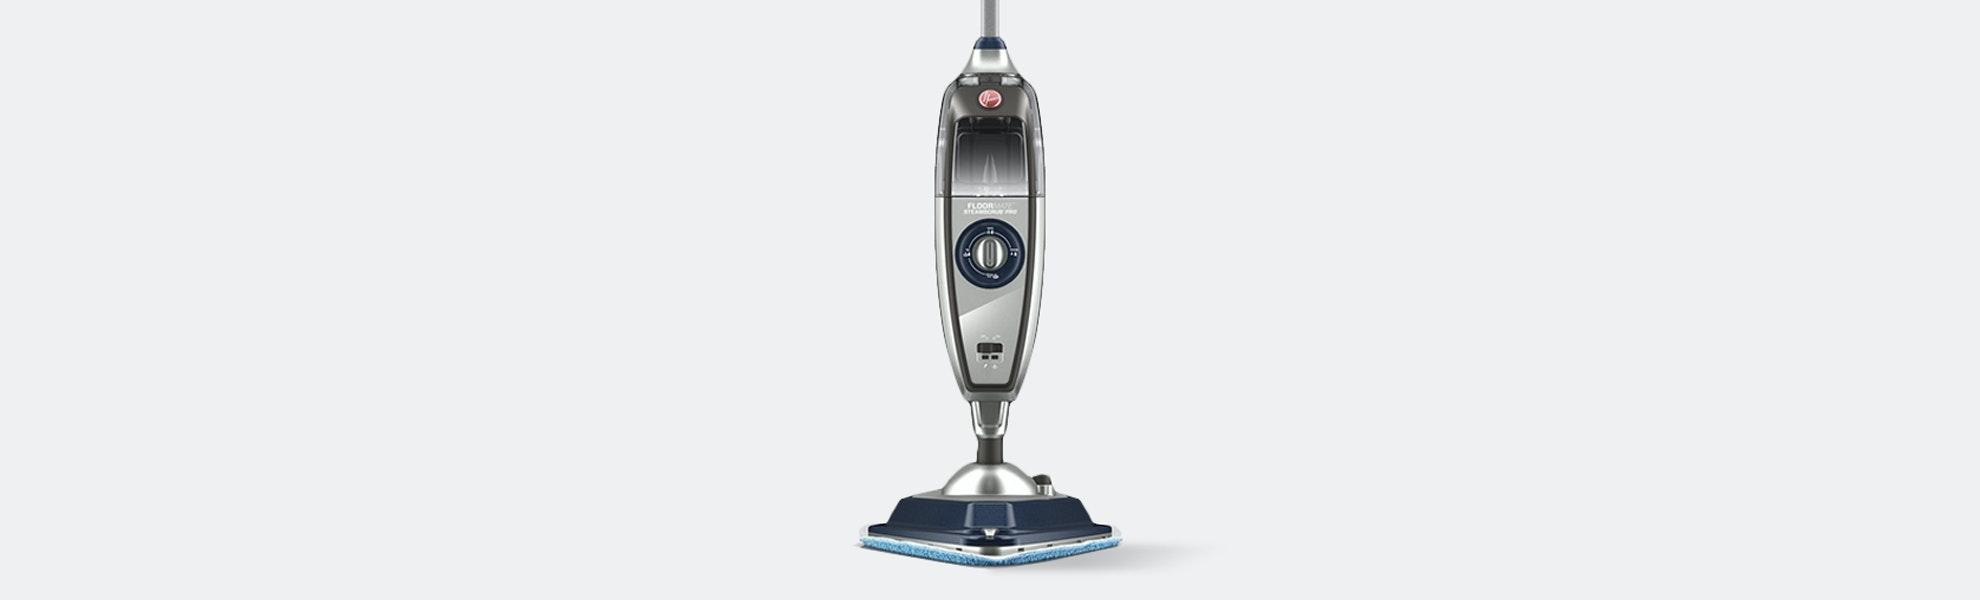 Hoover SteamScrub Pro Mop